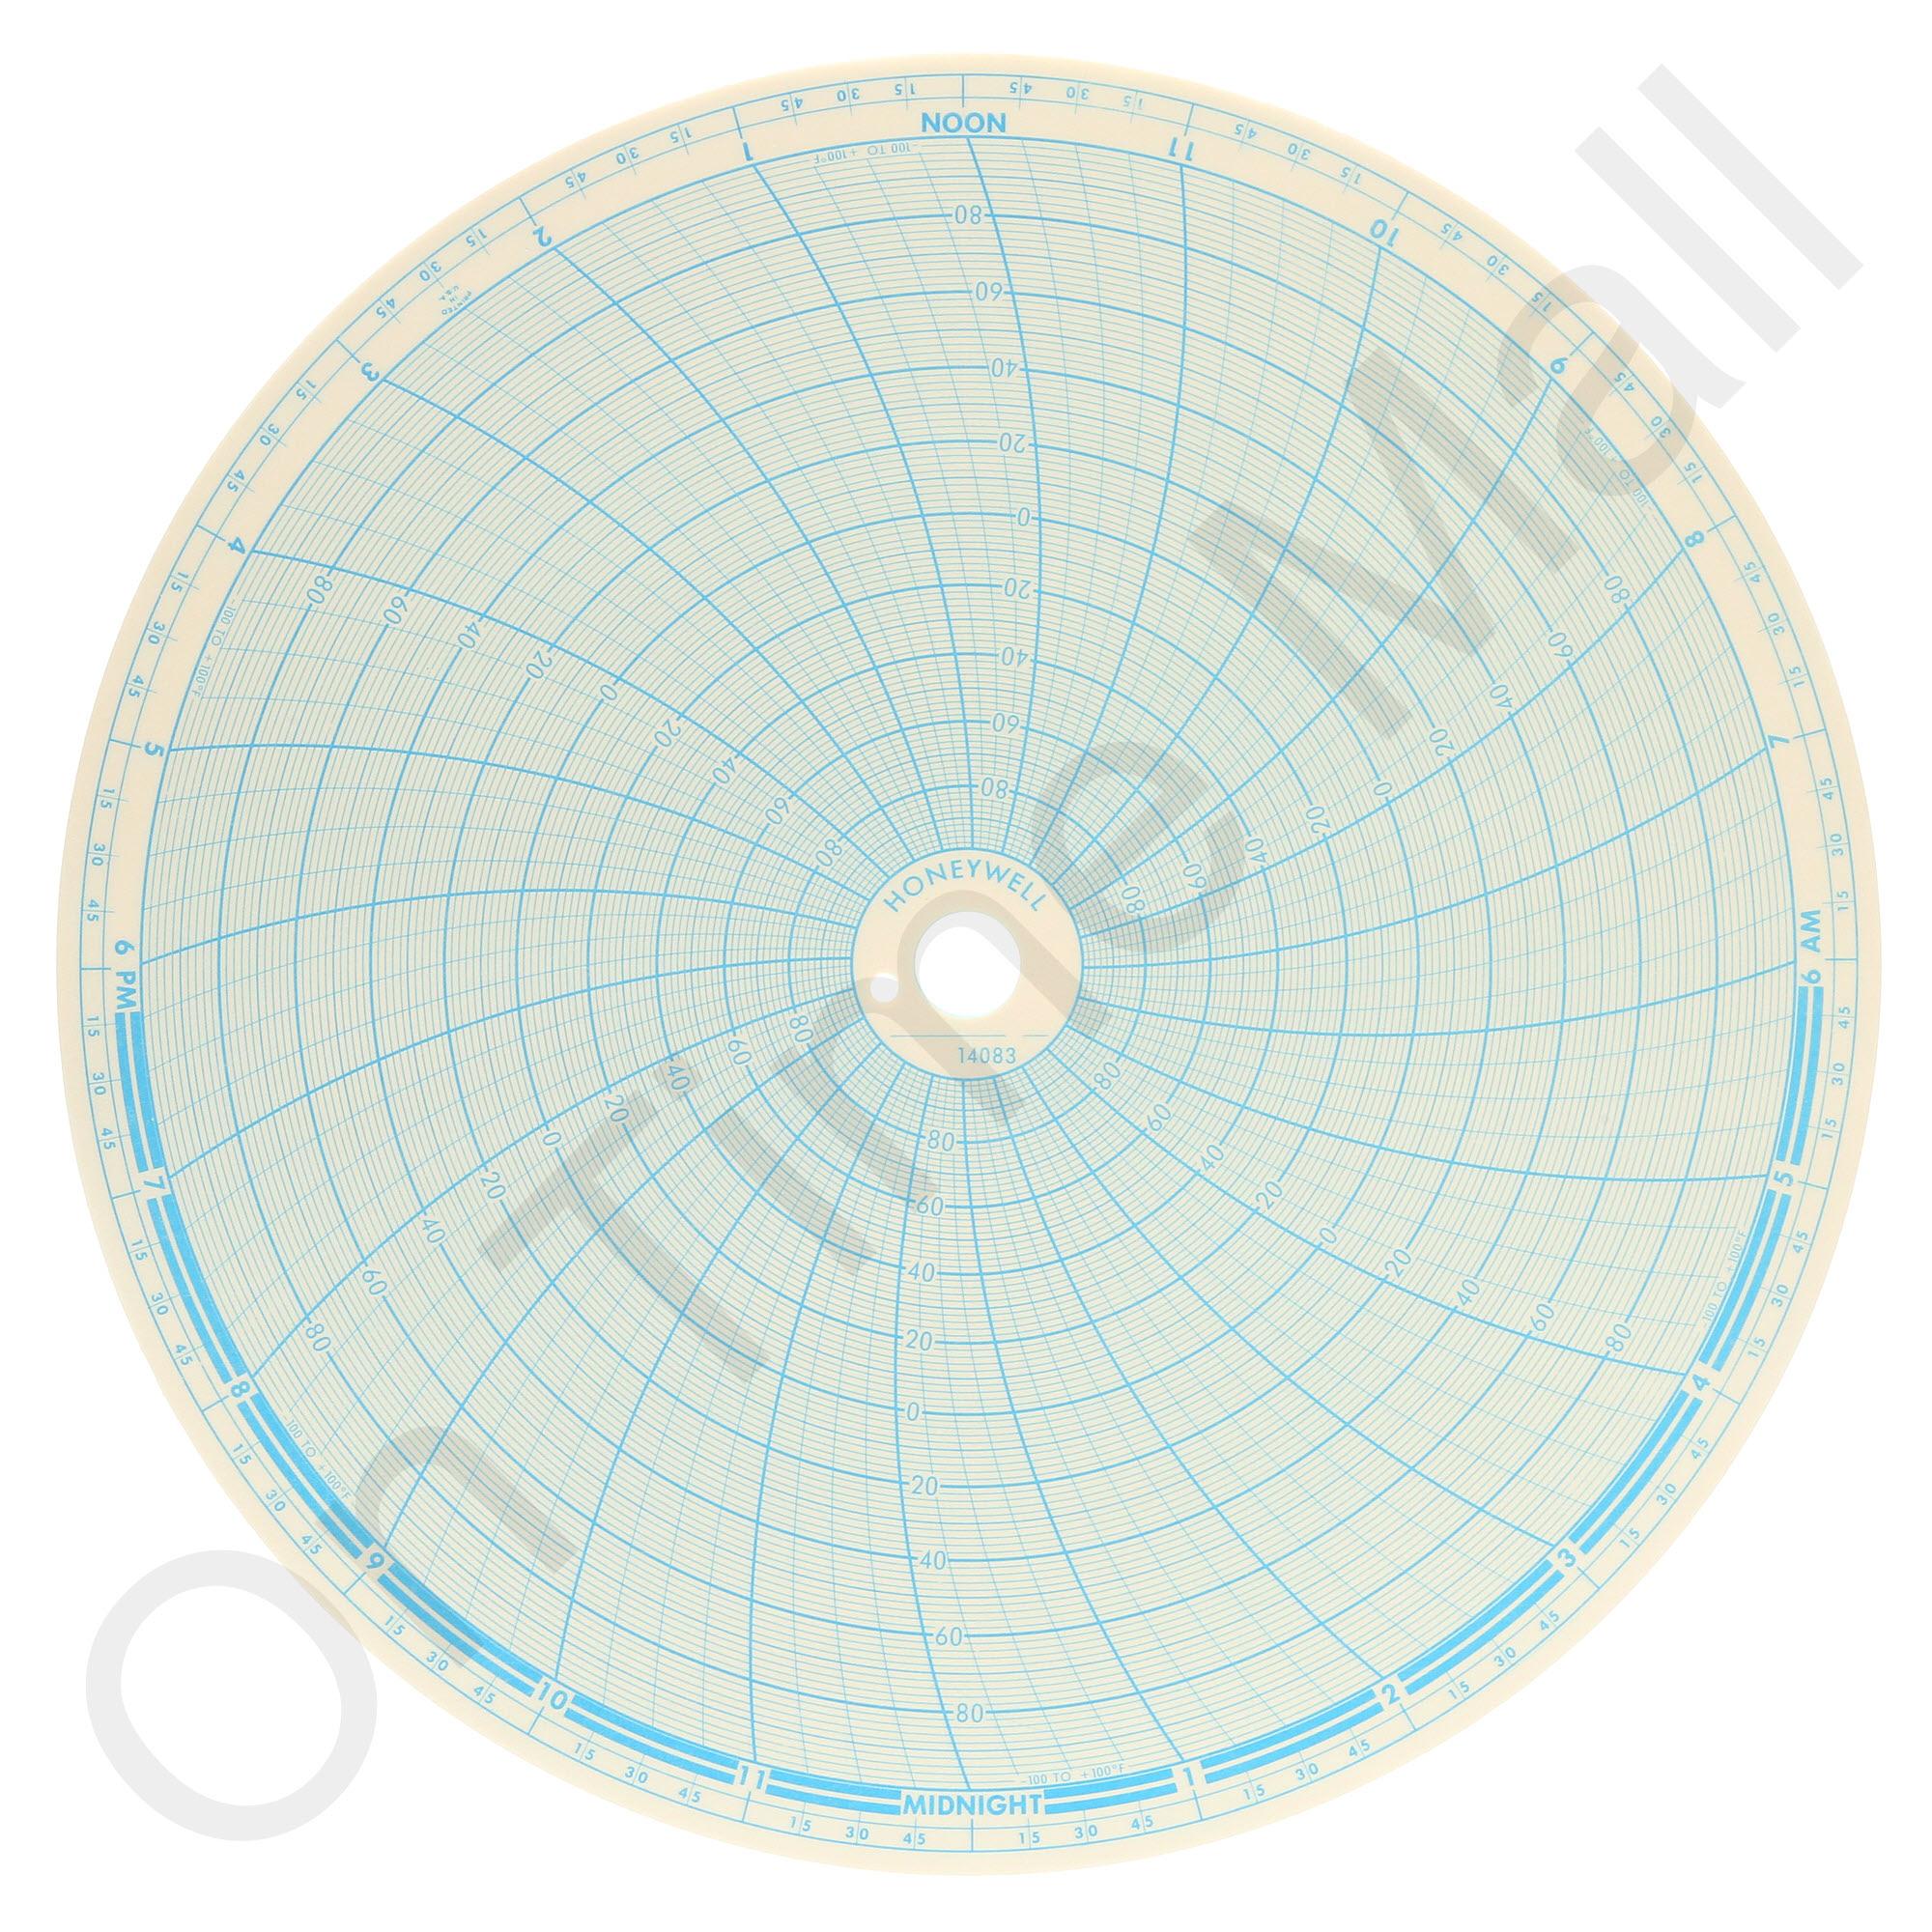 Honeywell 14083 Circular Charts